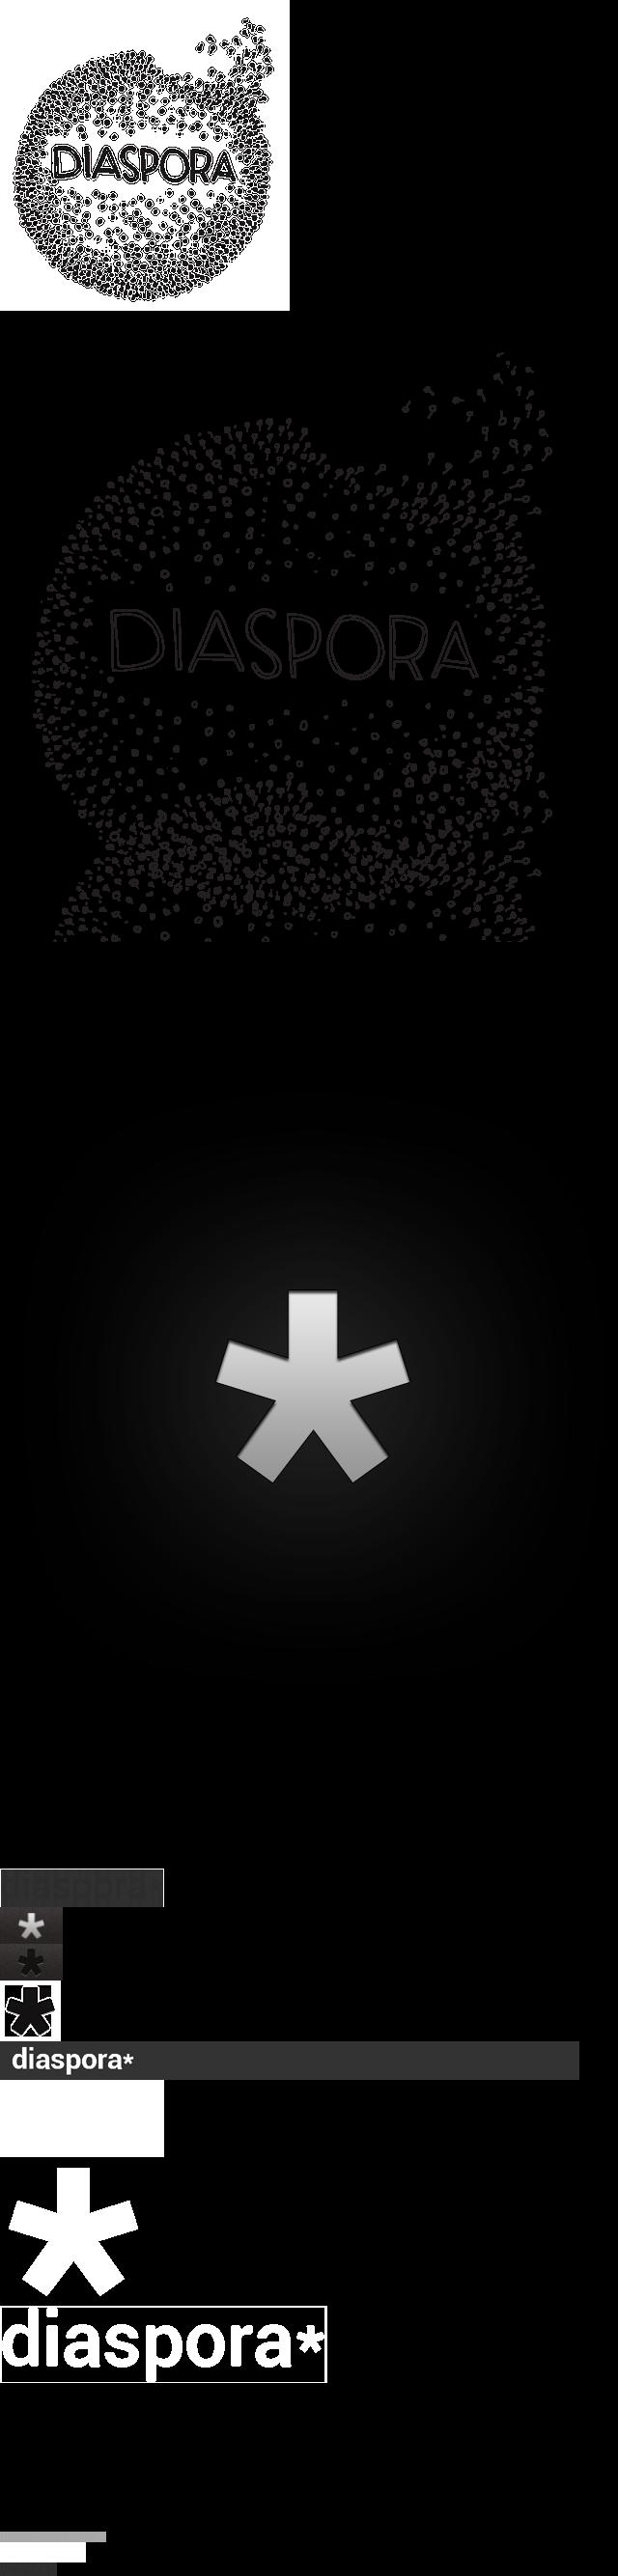 app/assets/images/branding-s78f0383719.png